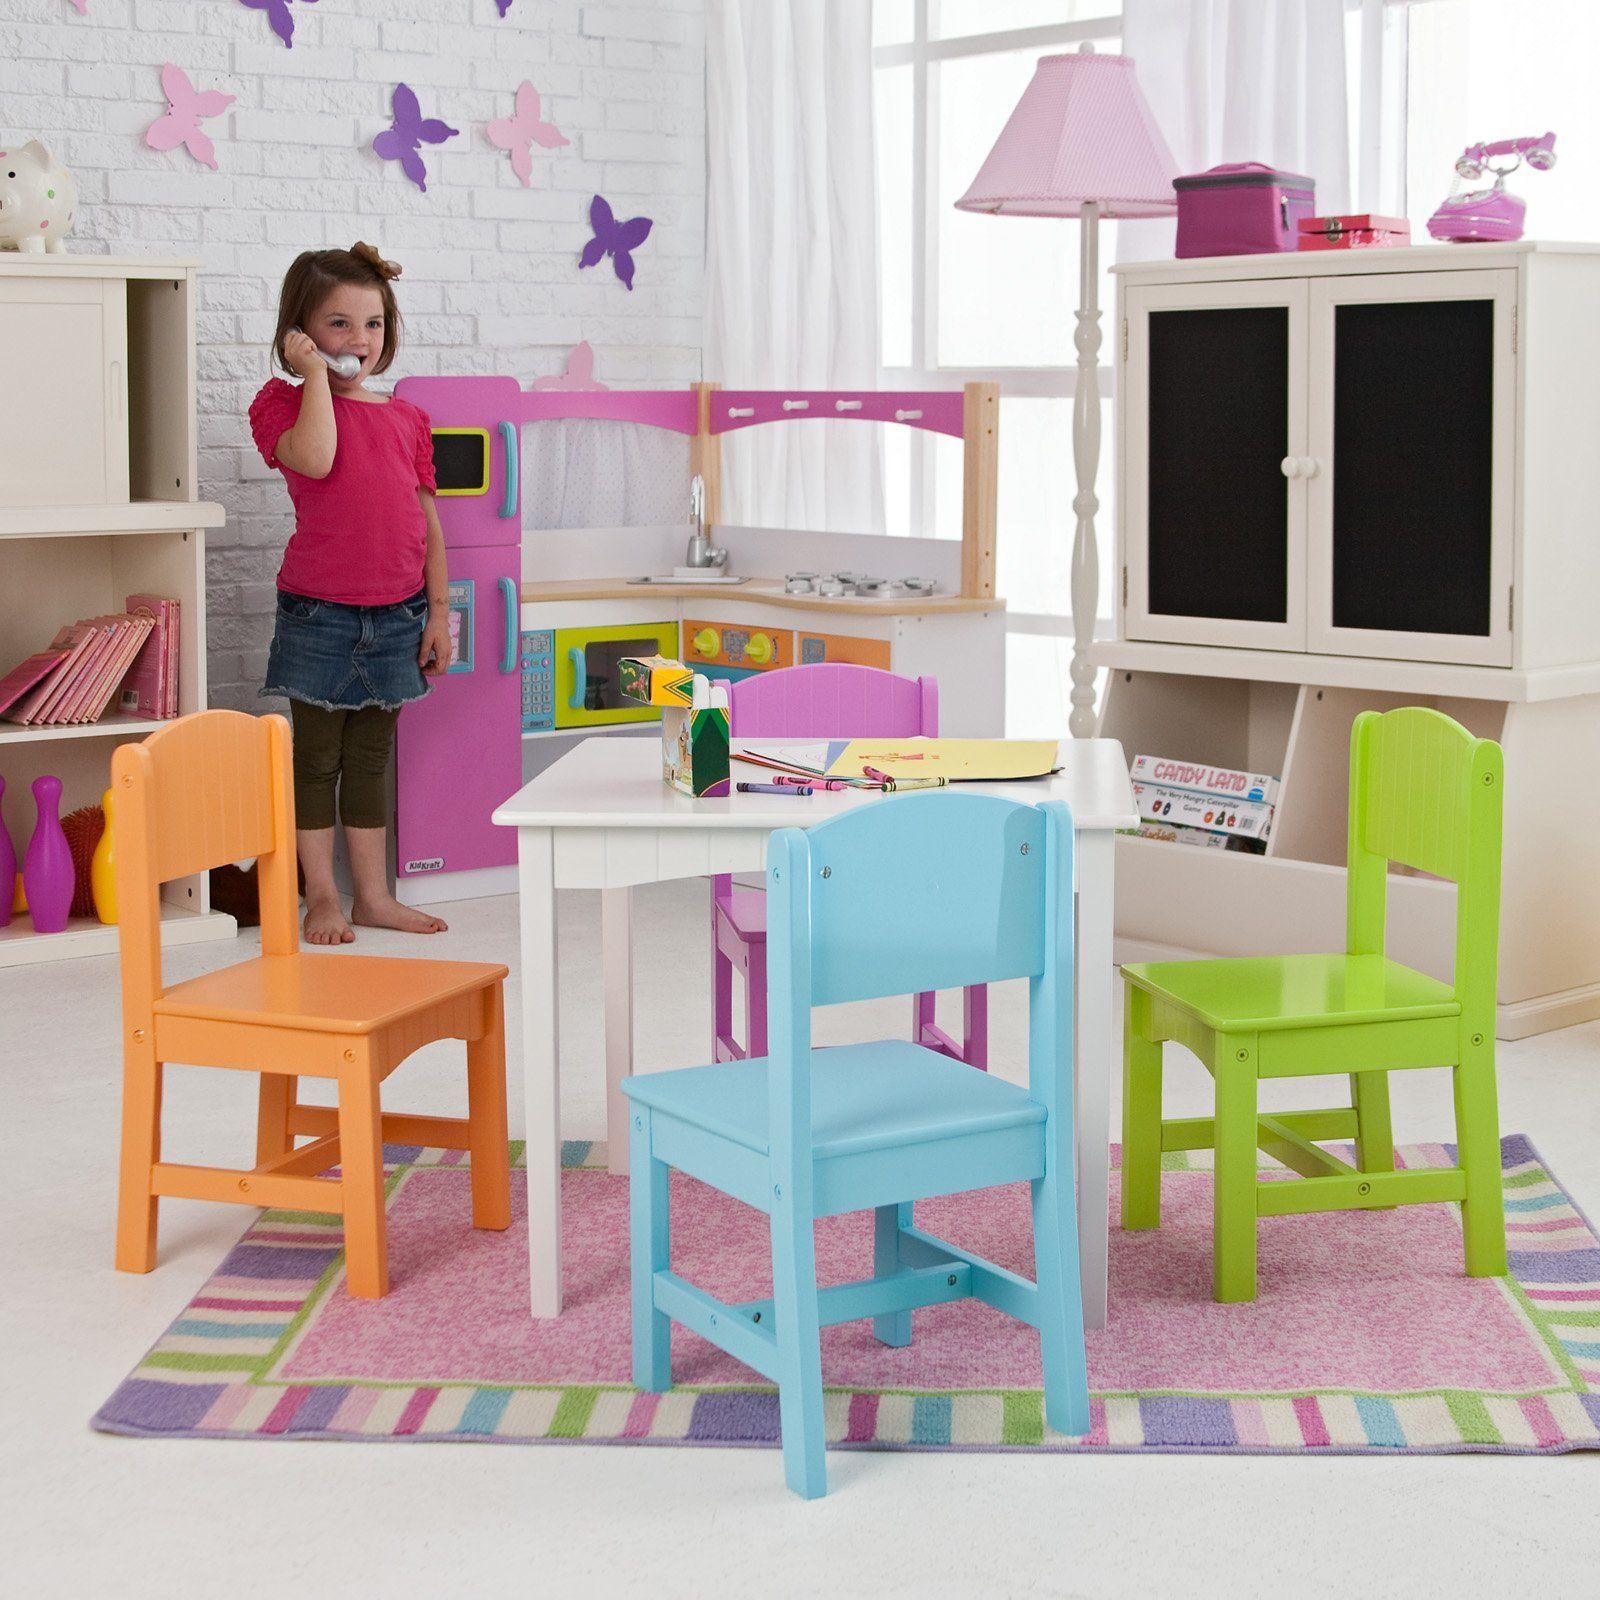 KidKraft Nantucket Big N Bright Table and Chair Set Go